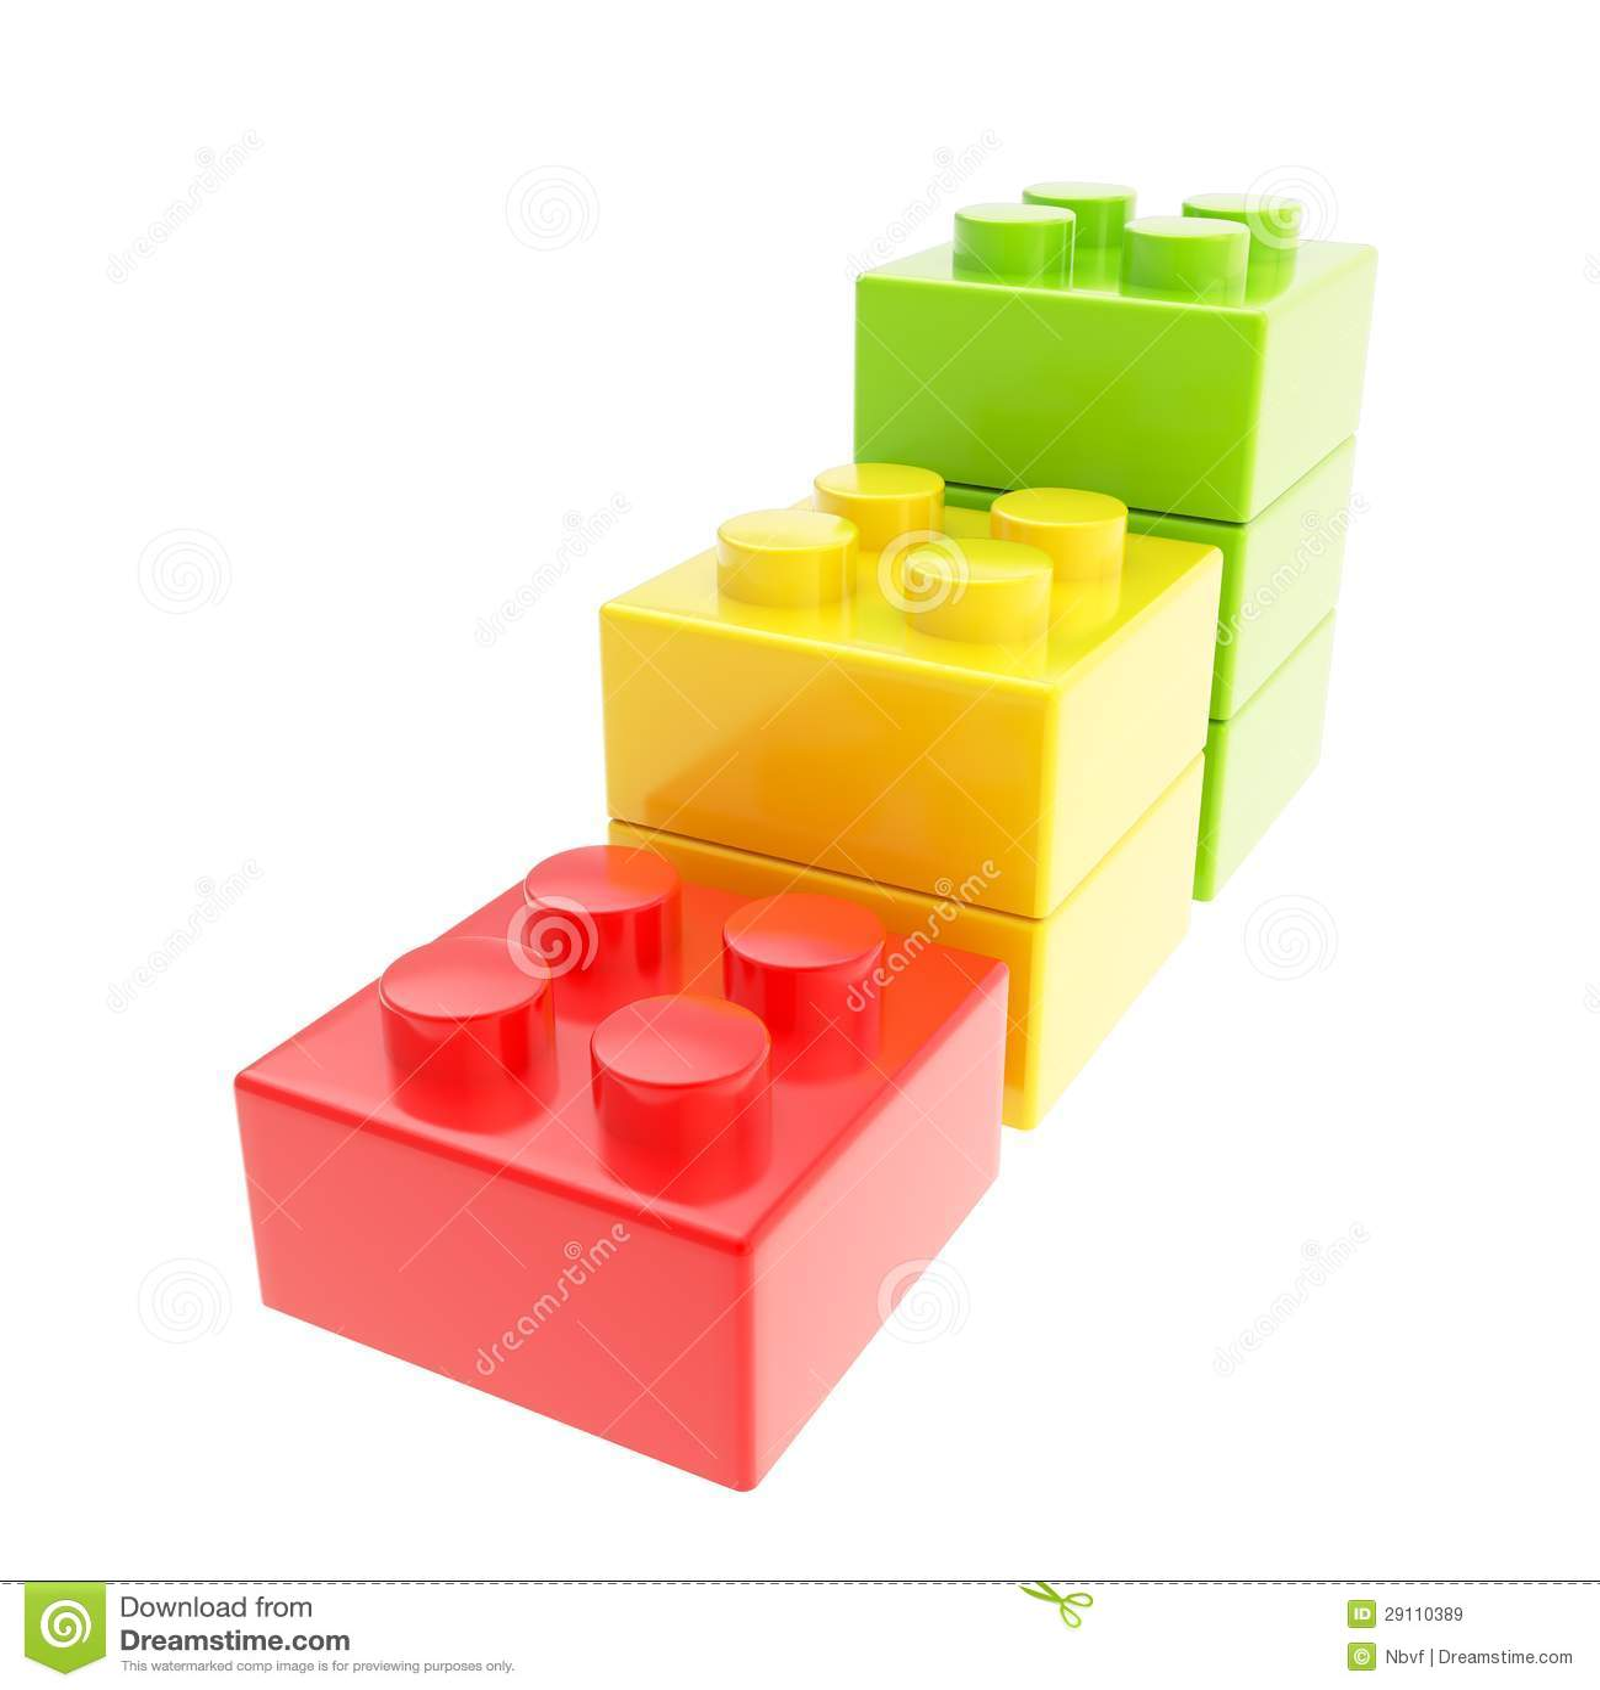 Three Step Stair Made Of Toy Construction Brick Blocks